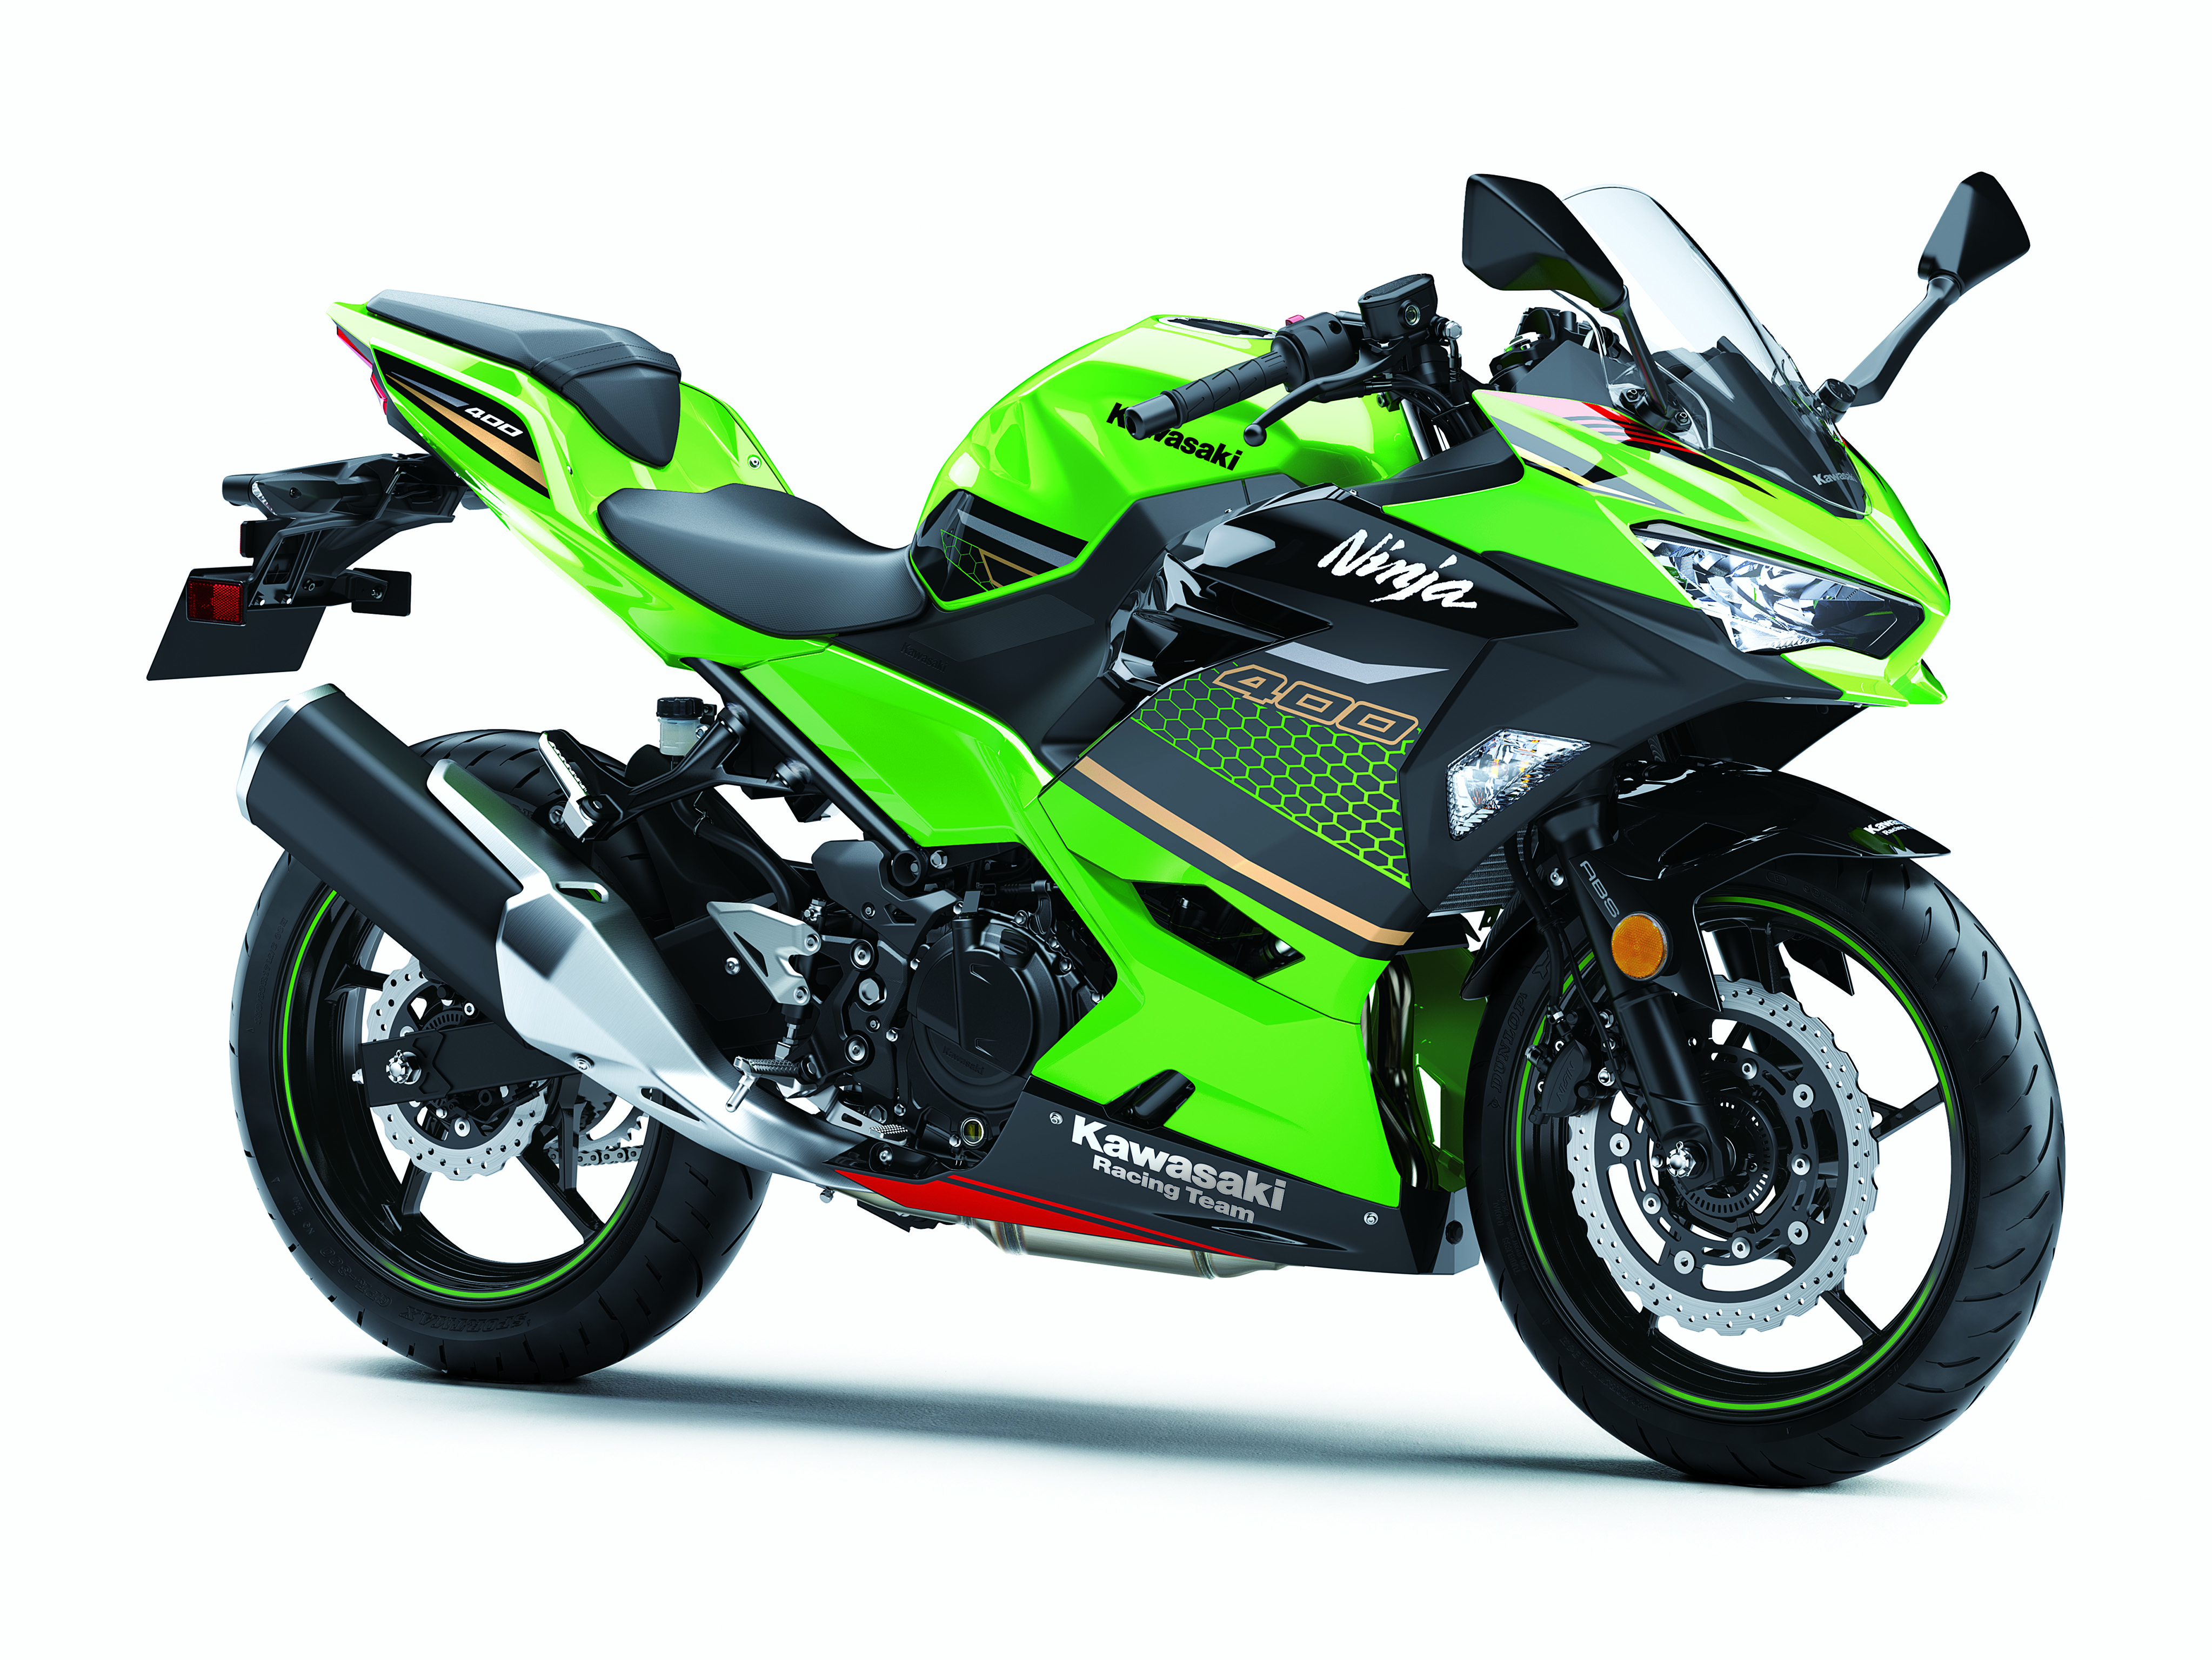 Kawasaki Ninja250/400の2020年モデル登場!今度は共通カラーになった